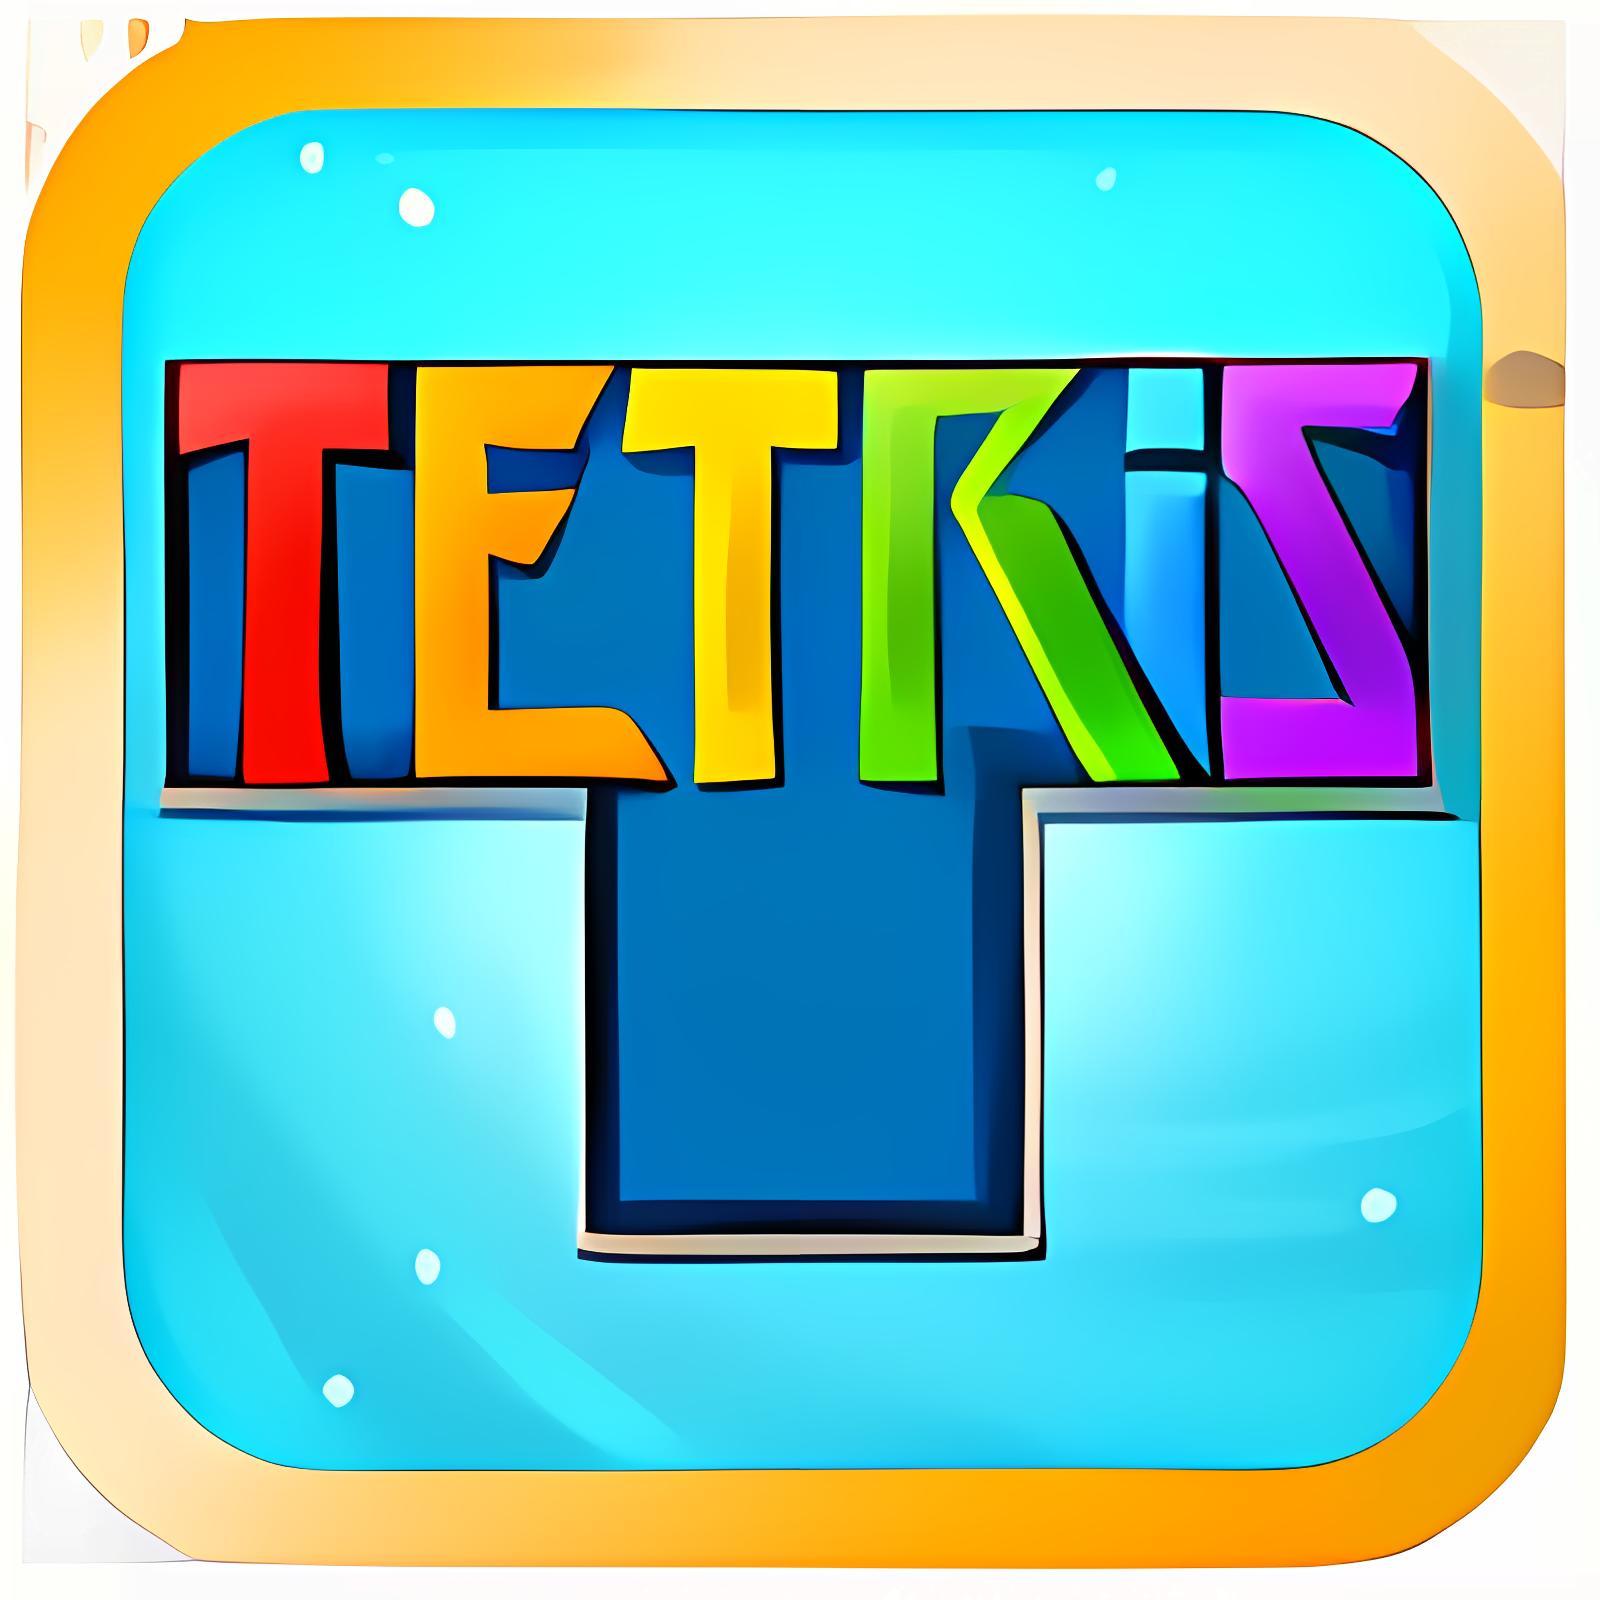 Tetris for iPad